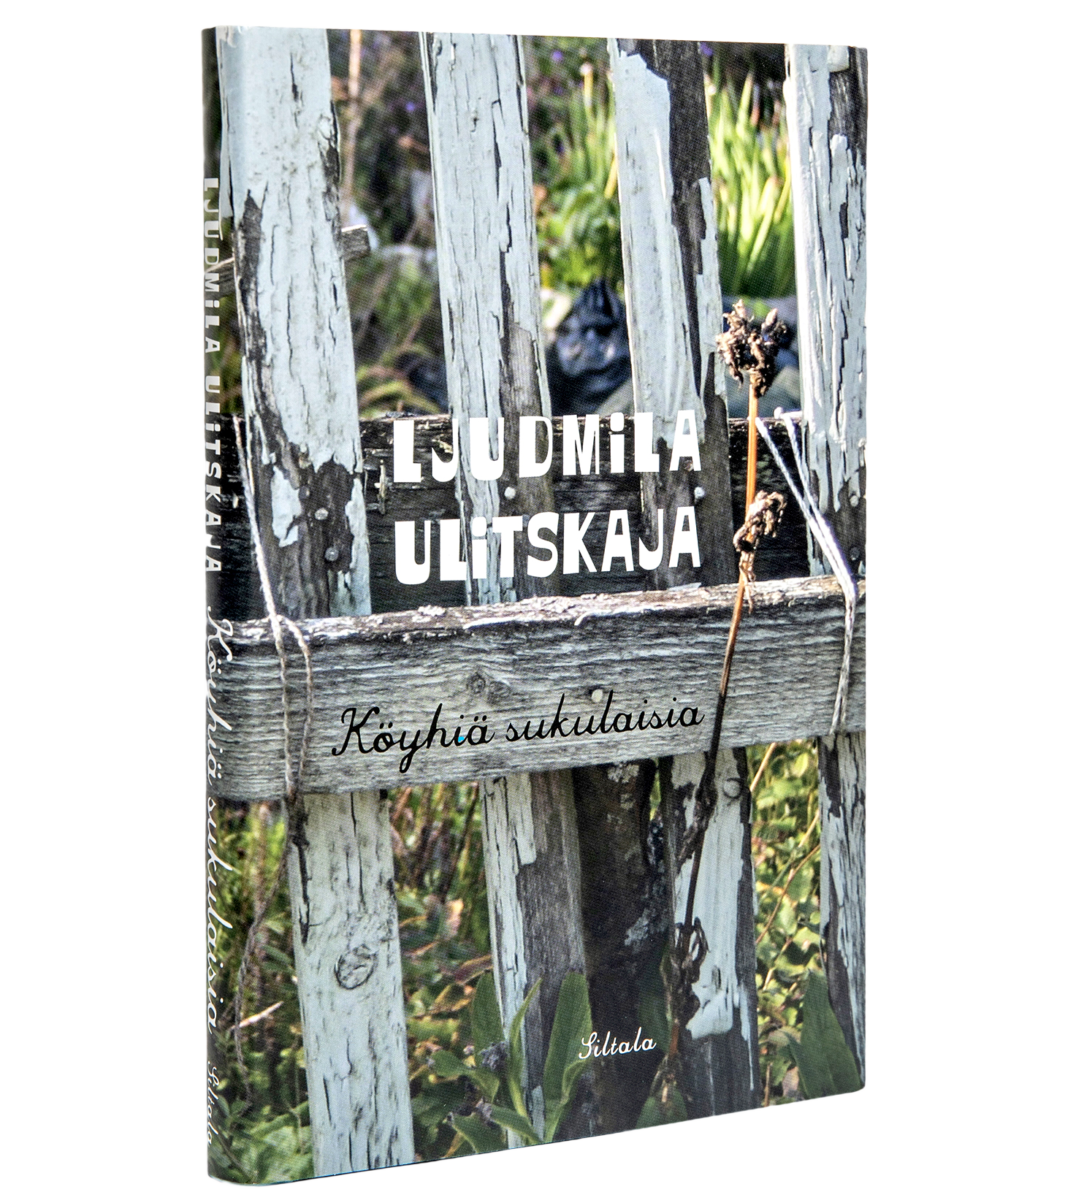 Ljudmila Ulitskaja: Köyhiä sukulaisia. Suom. Arja Pikkupeura. 187 s. Siltala, 2020.